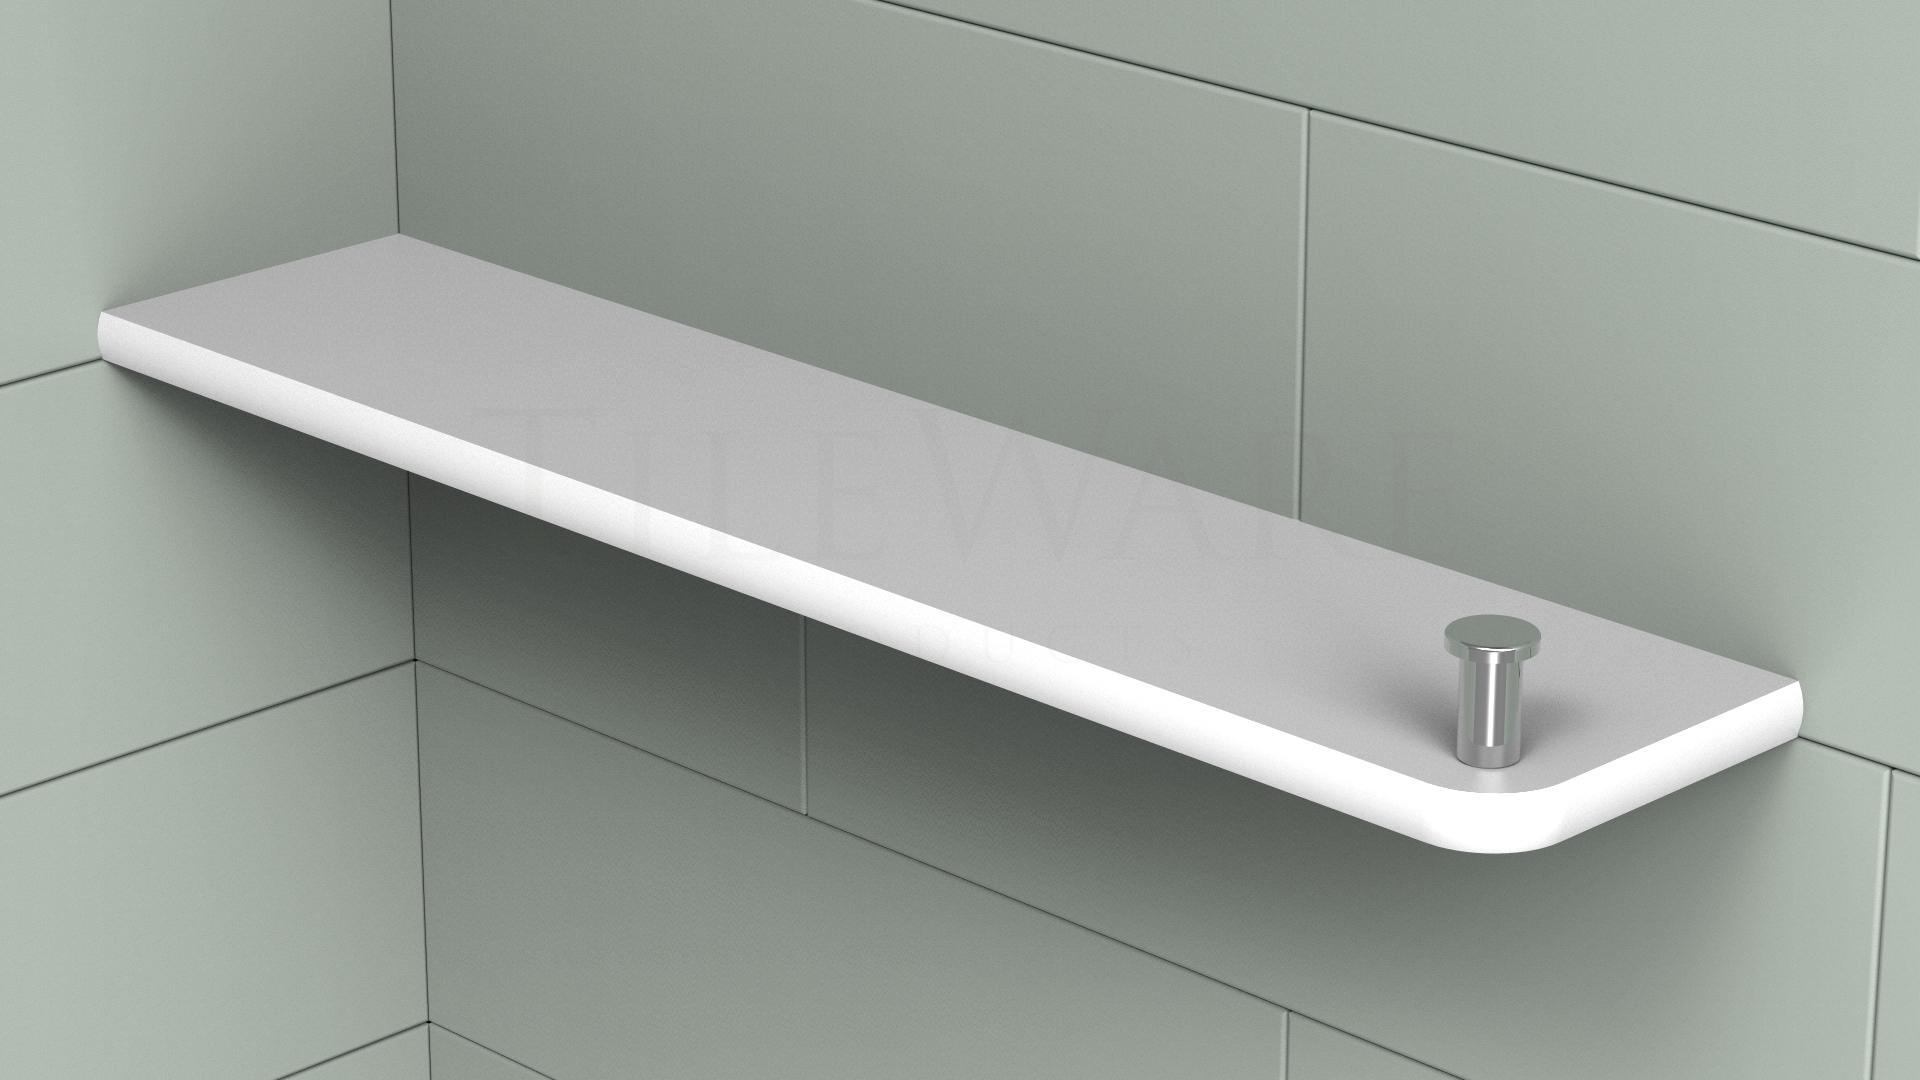 Boundless Rectangular Corner Shelf With Shower Hook For Tile